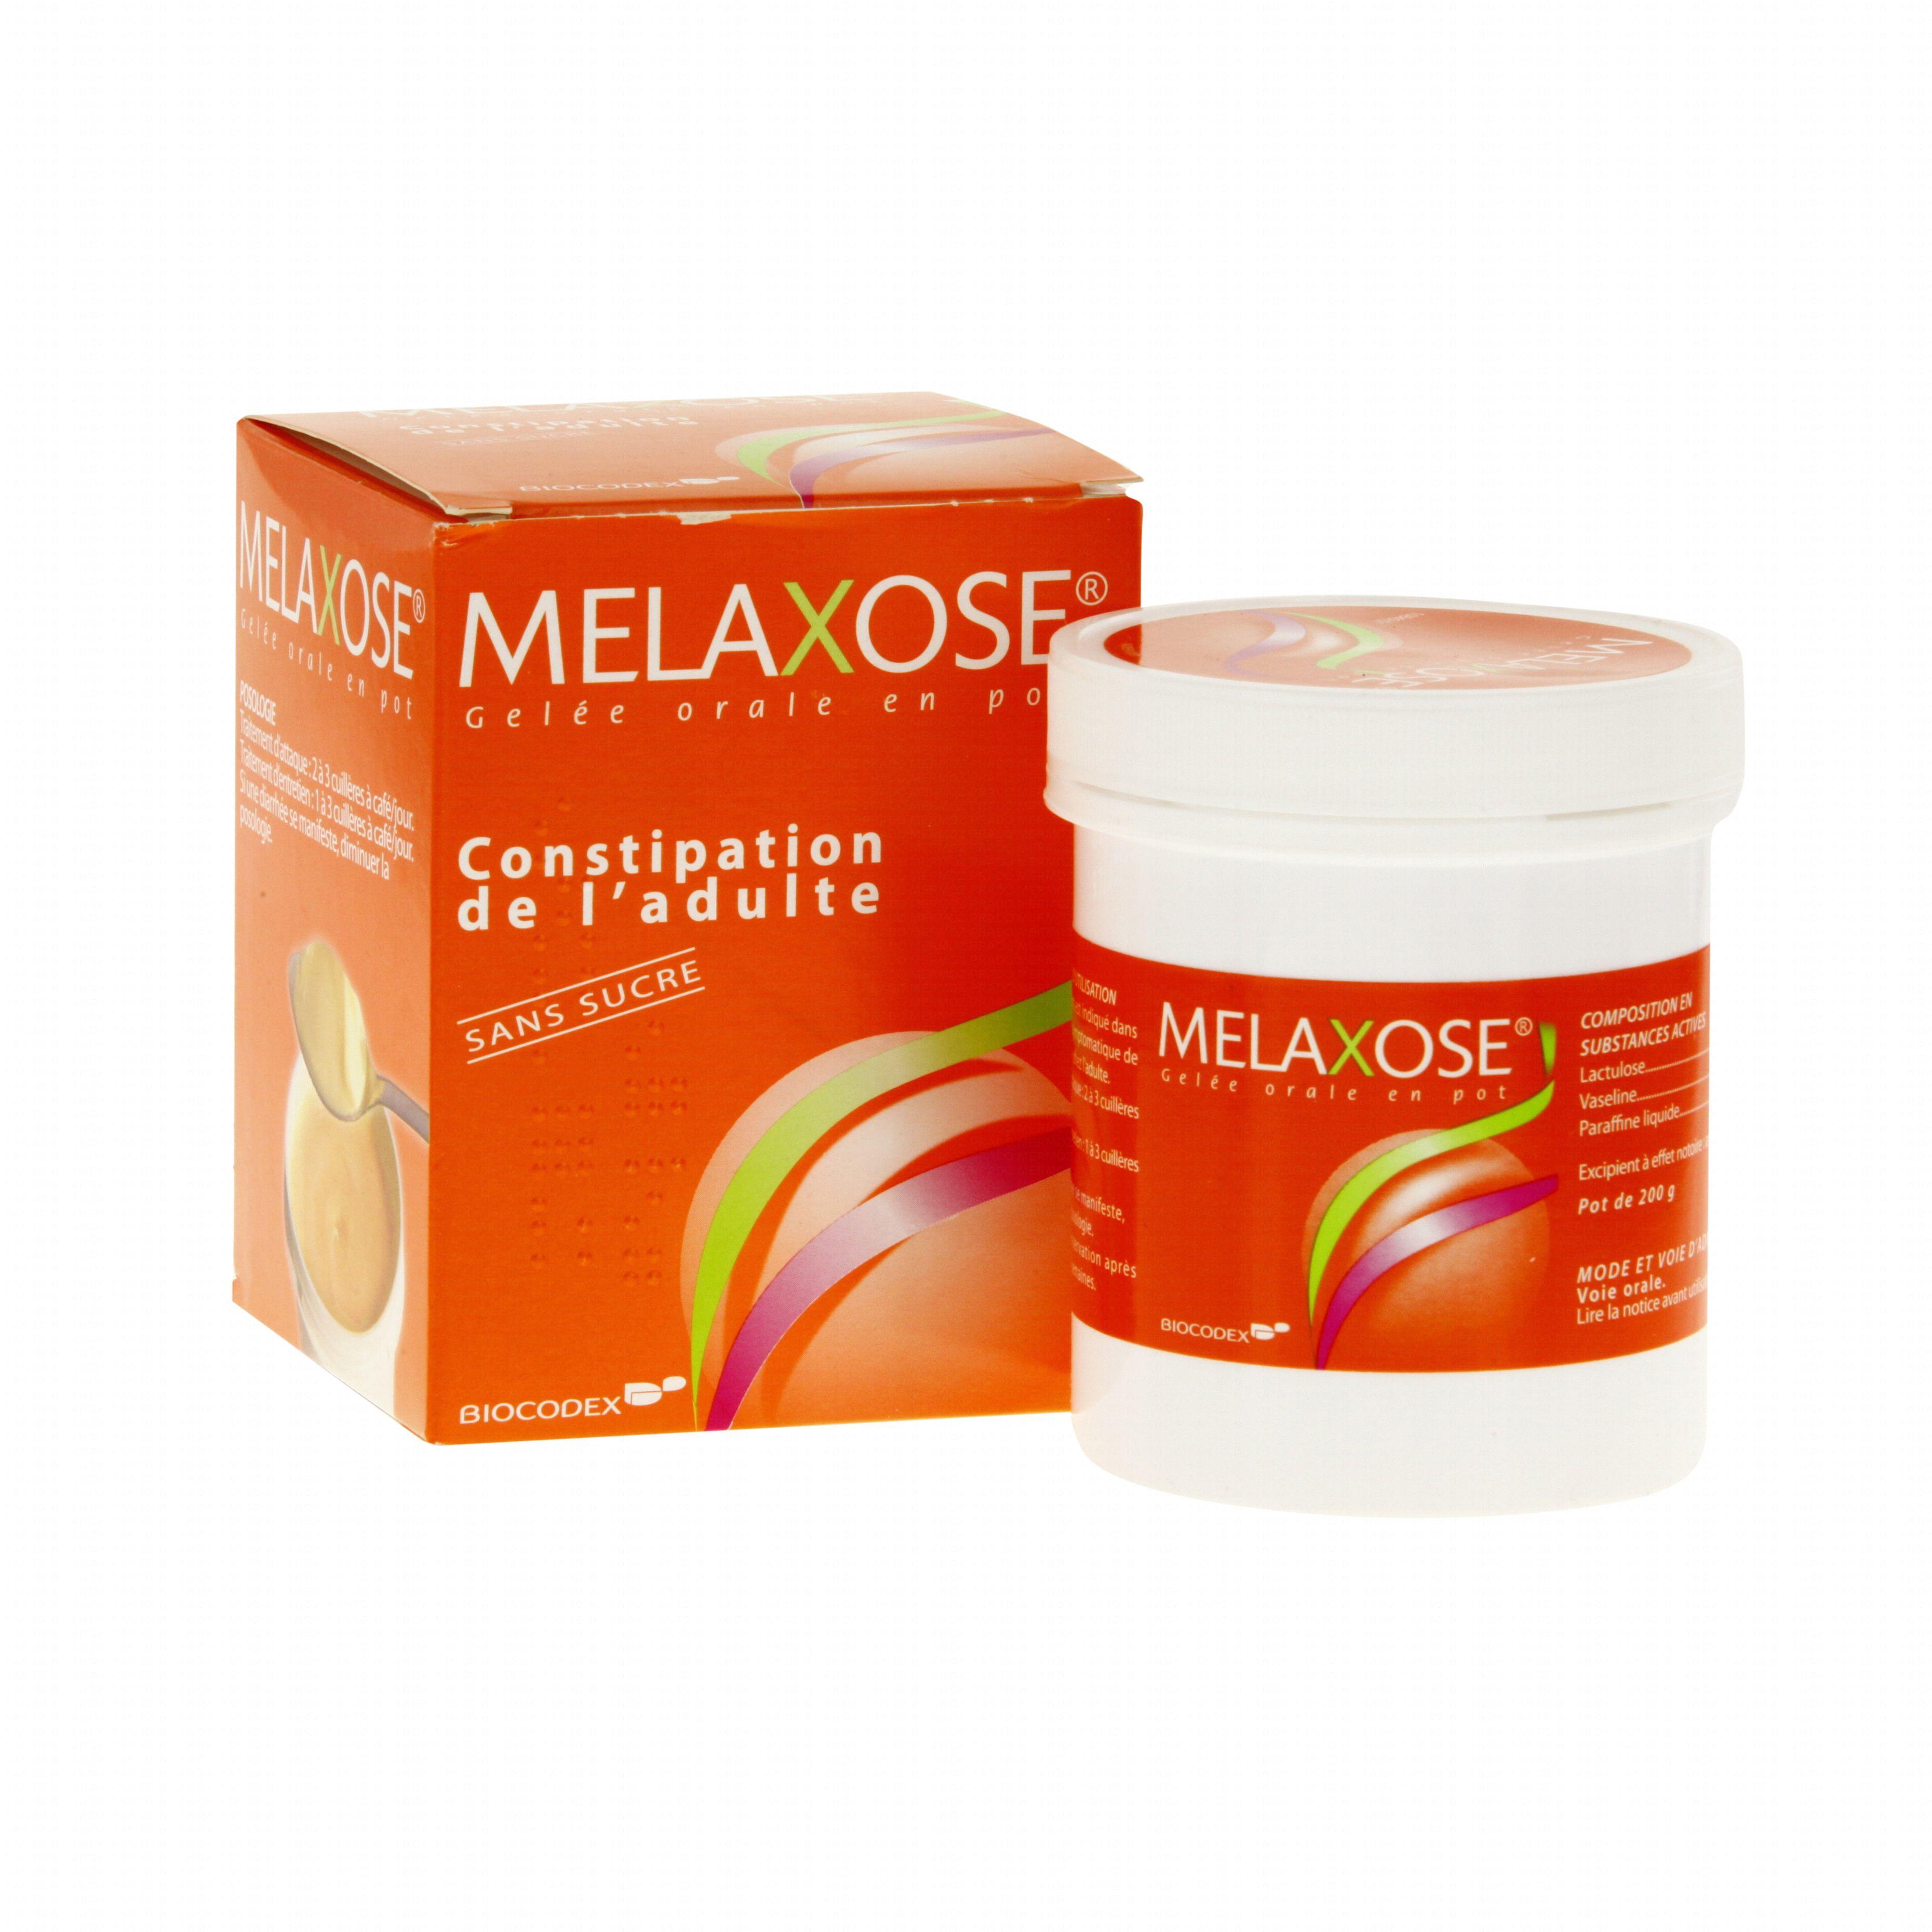 Melaxose Biocodex (médicament conseil) - Pharmacie en